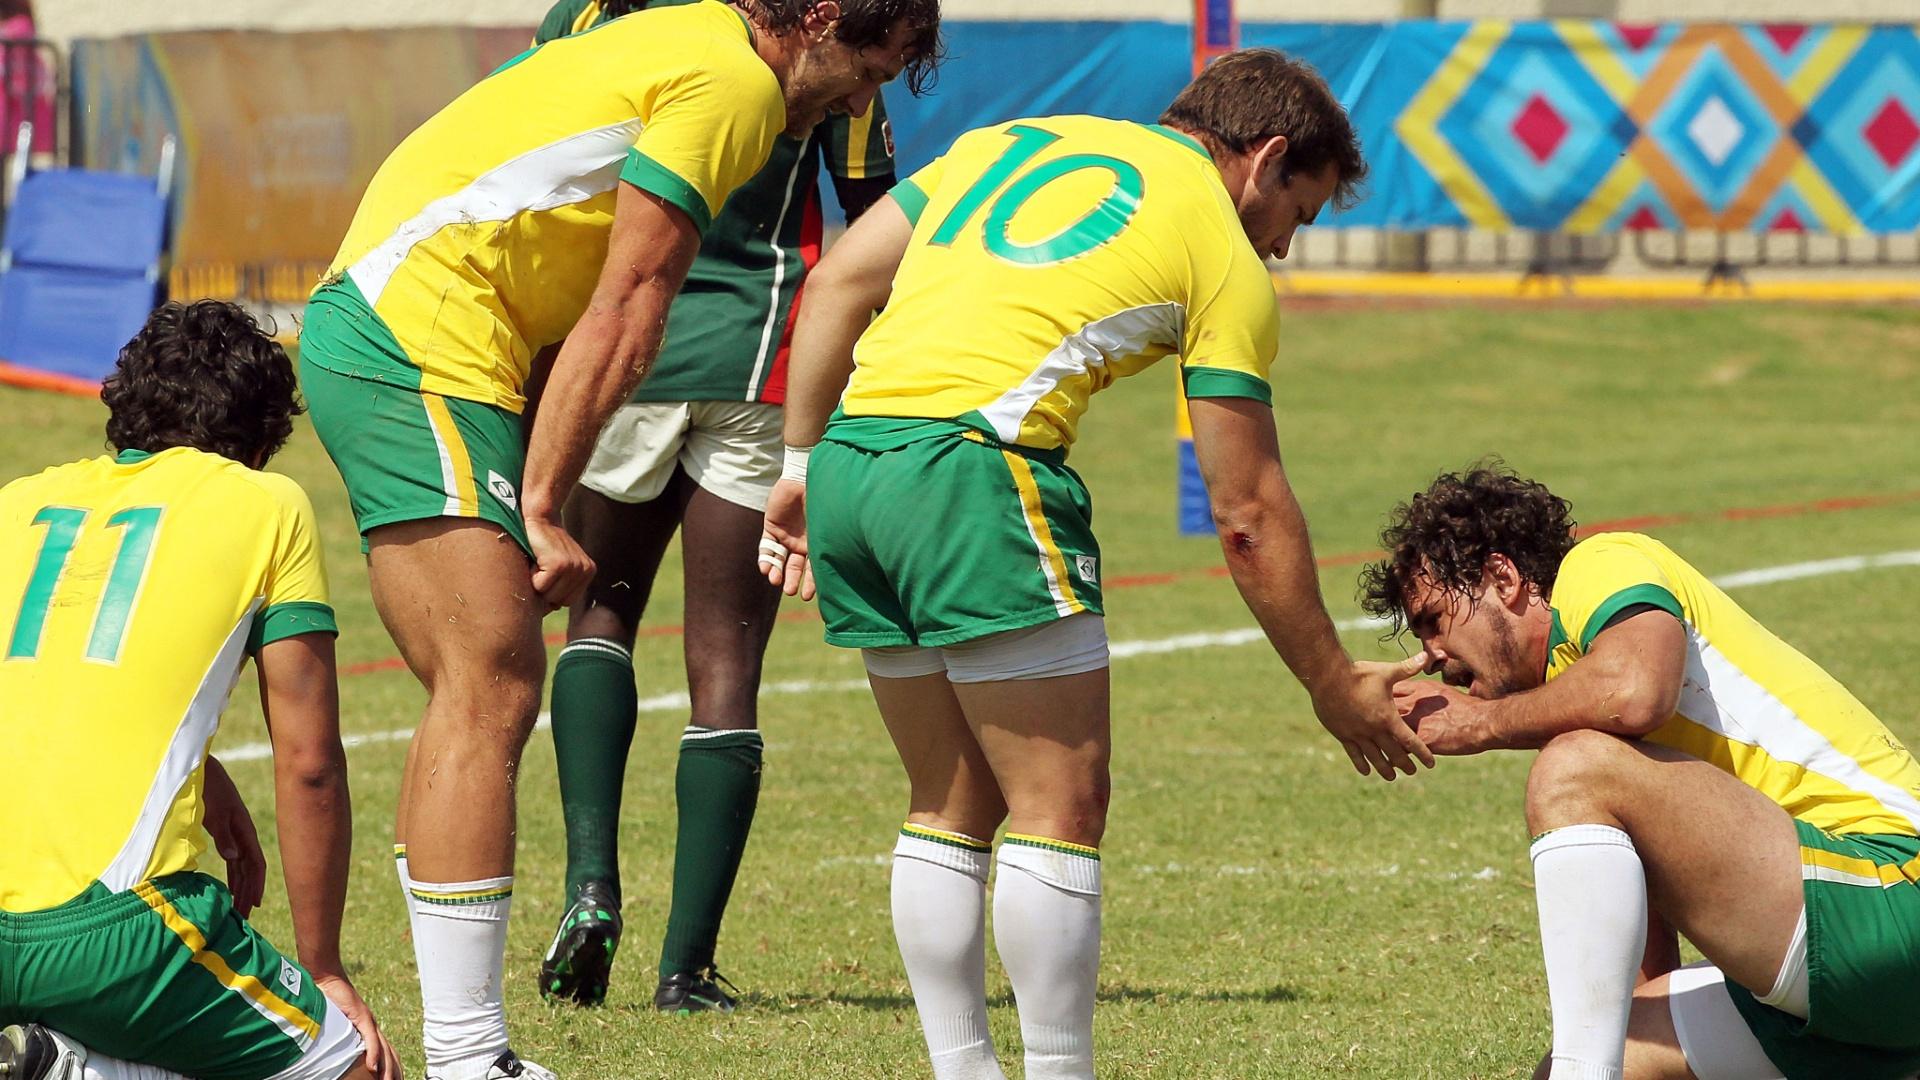 Brasil venceu a Guiana na última partida e foi sétimo no rúgbi do Pan-2011 (30/10/2011)